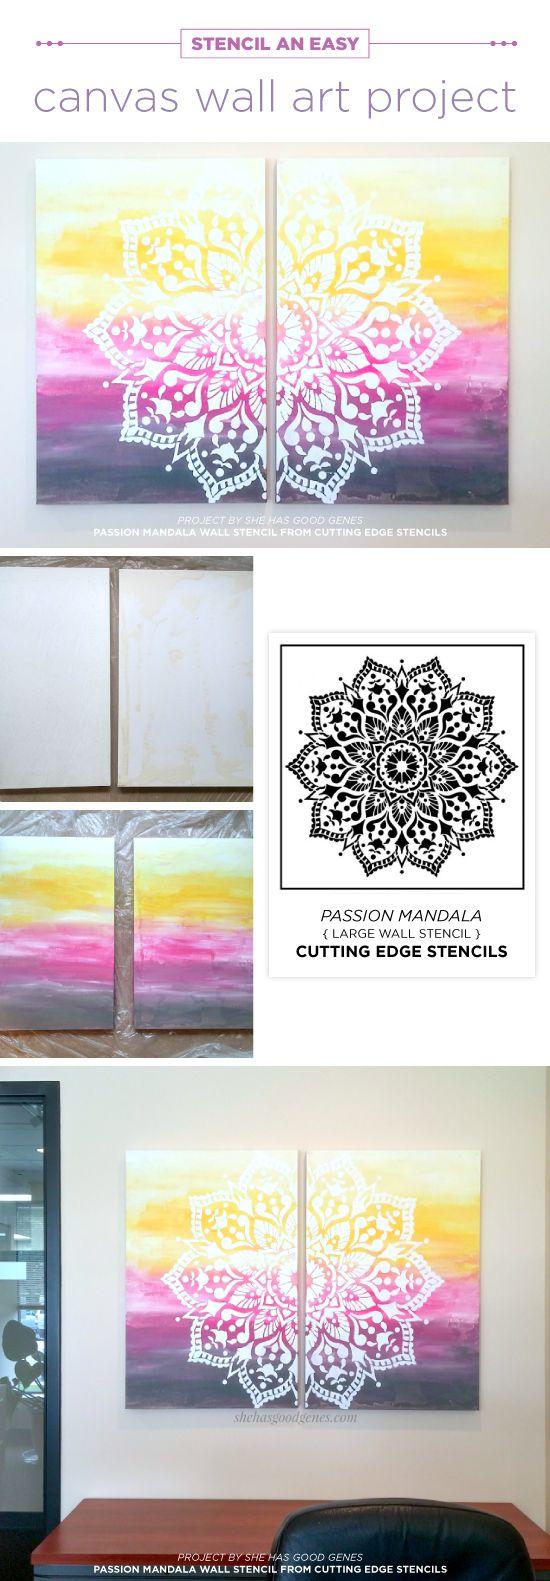 Cutting Edge Stencils shares how to stencil DIY canvas artwork using the Passion Mandala wall pattern. http://www.cuttingedgestencils.com/passion-mandala-stencil-yoga-decal-wall-stencils-mandalas.html